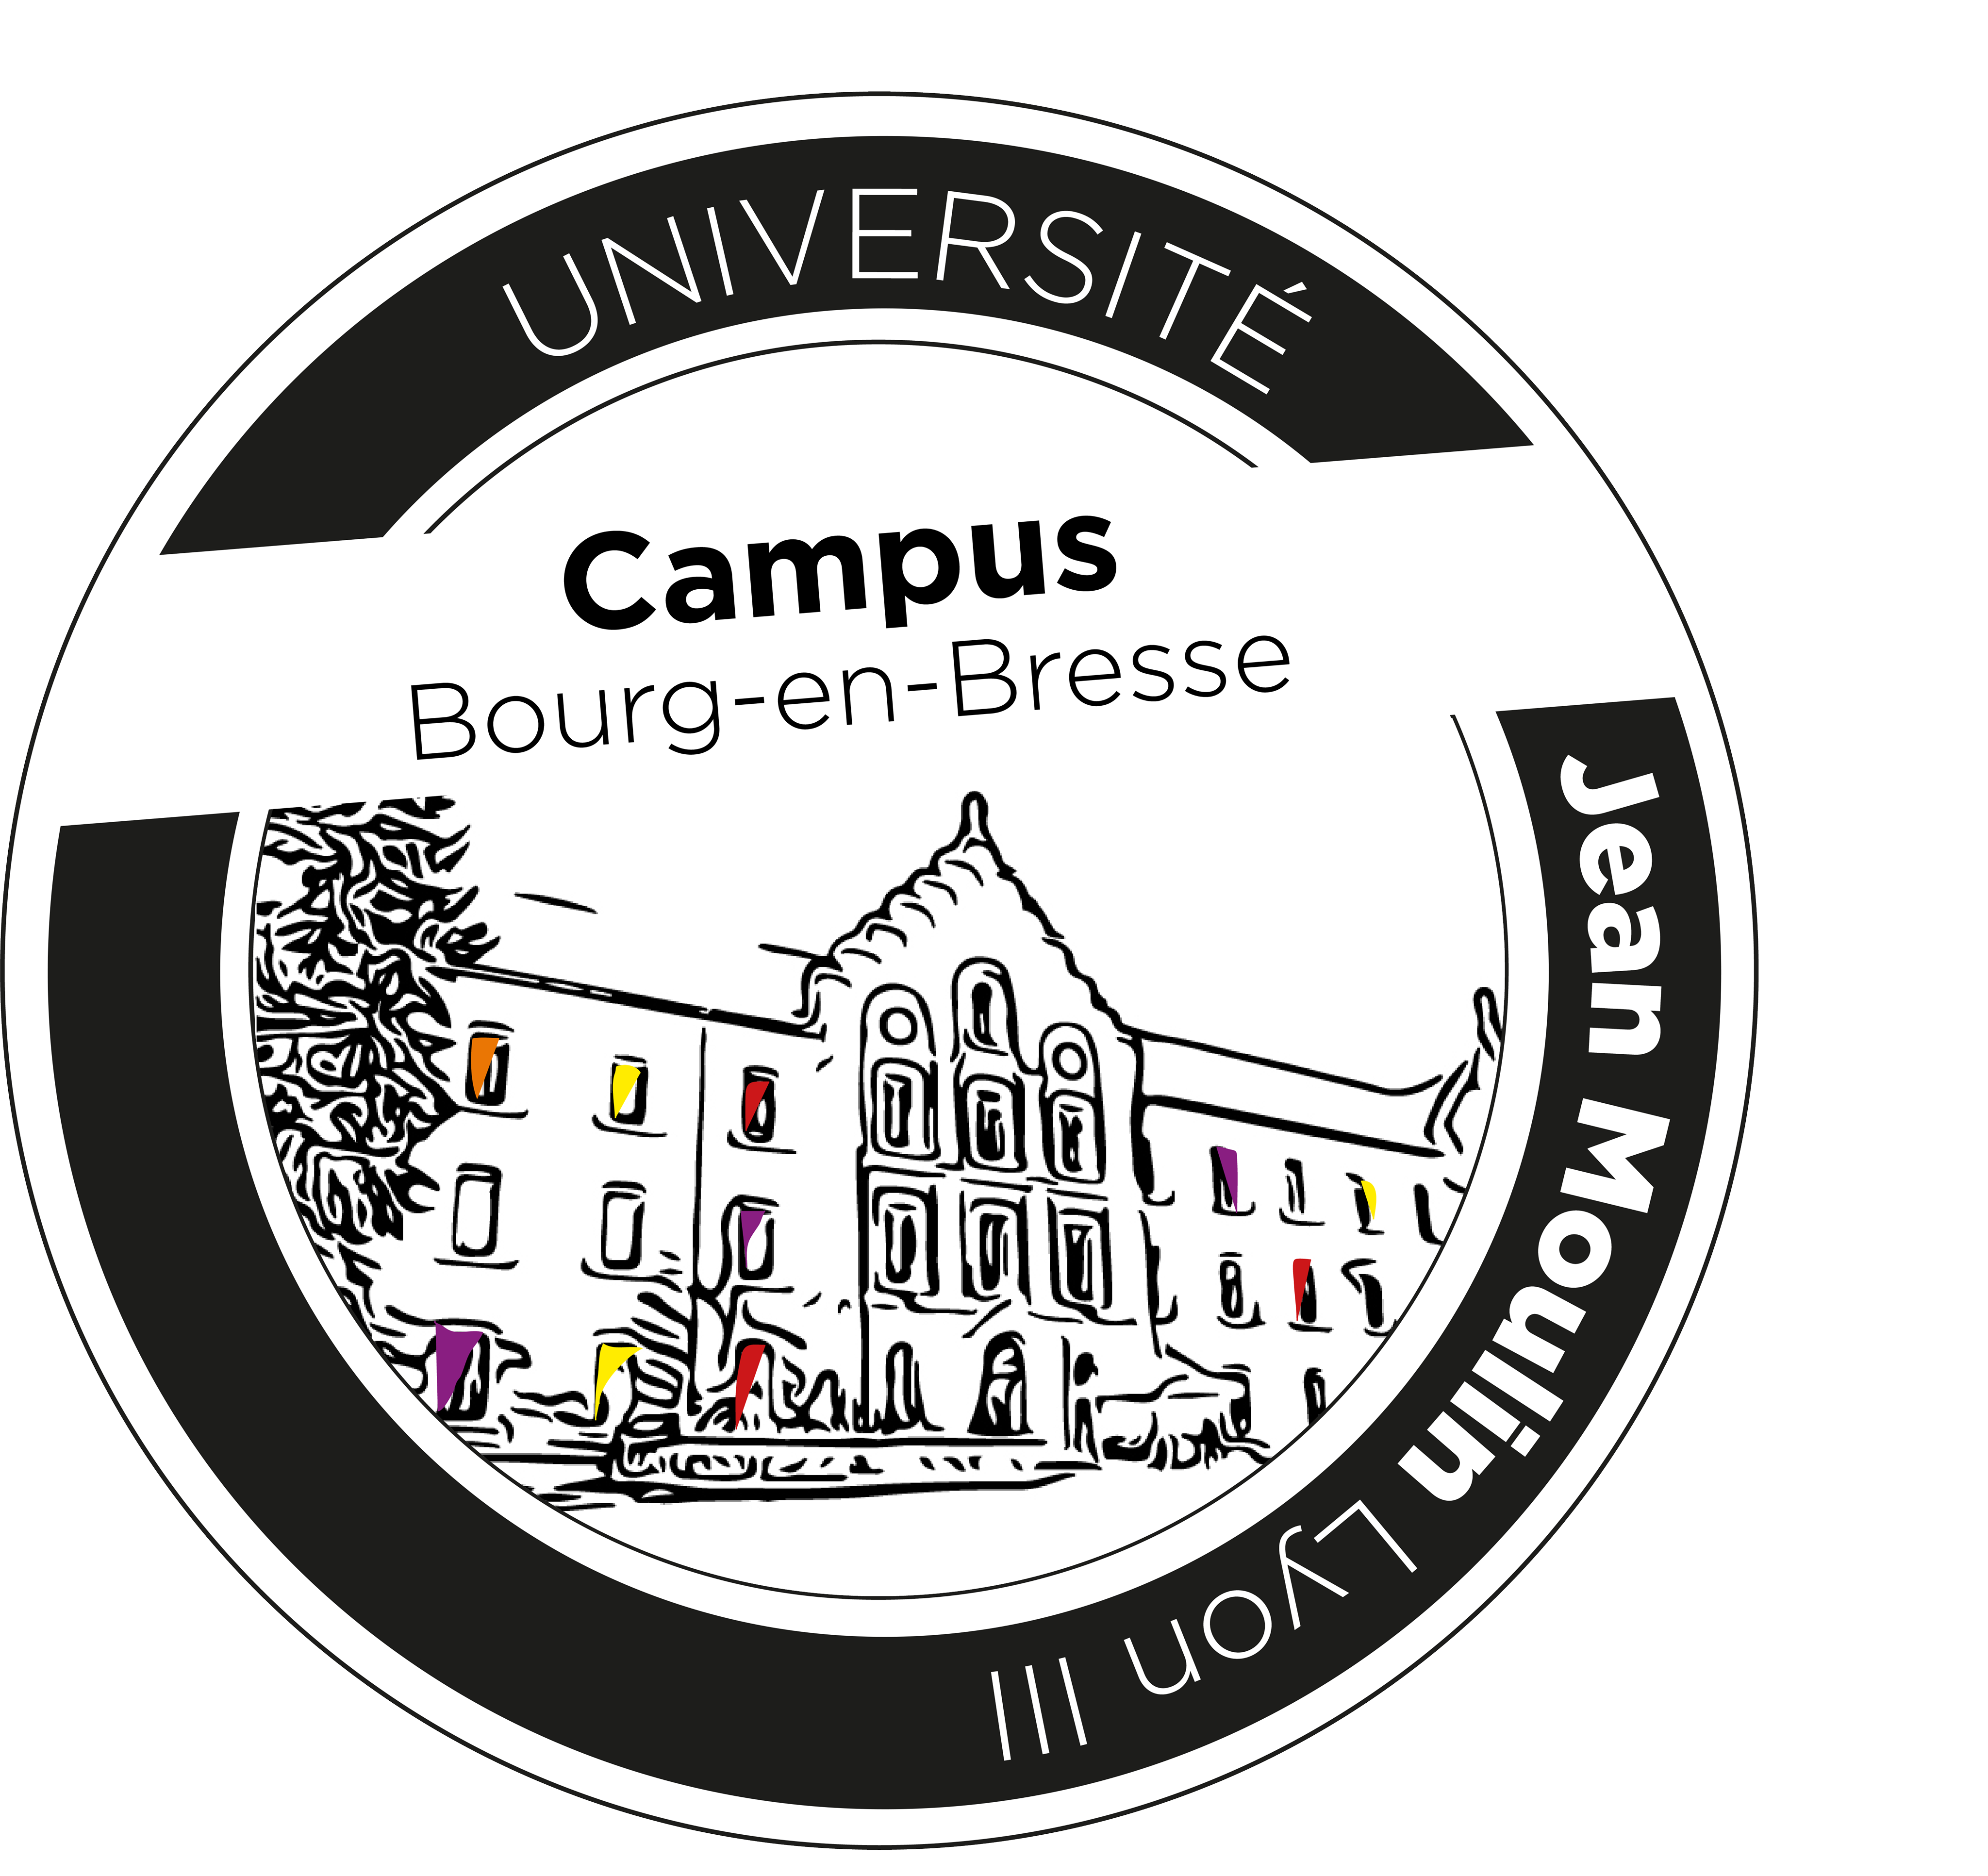 Campus de Bourg-en-Bresse